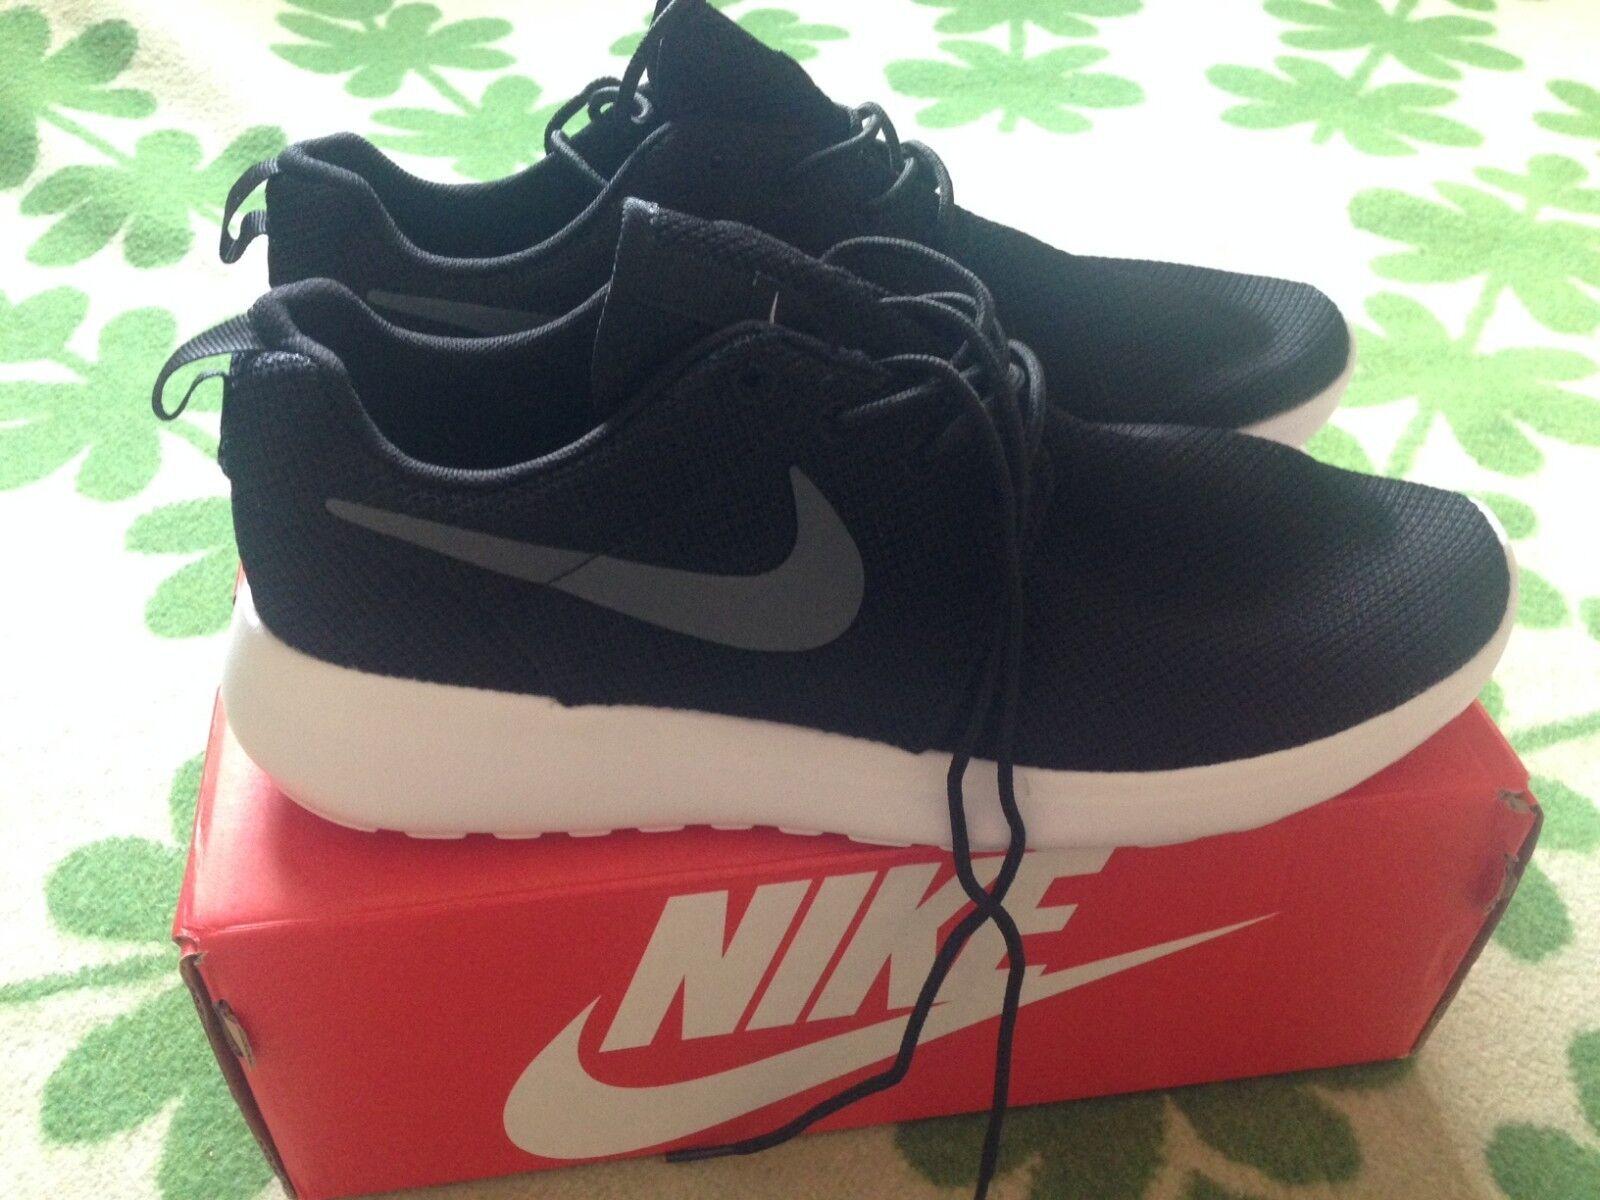 Nike Roshe Run Black/White Mens Trainers Shoes UK9 Great discount